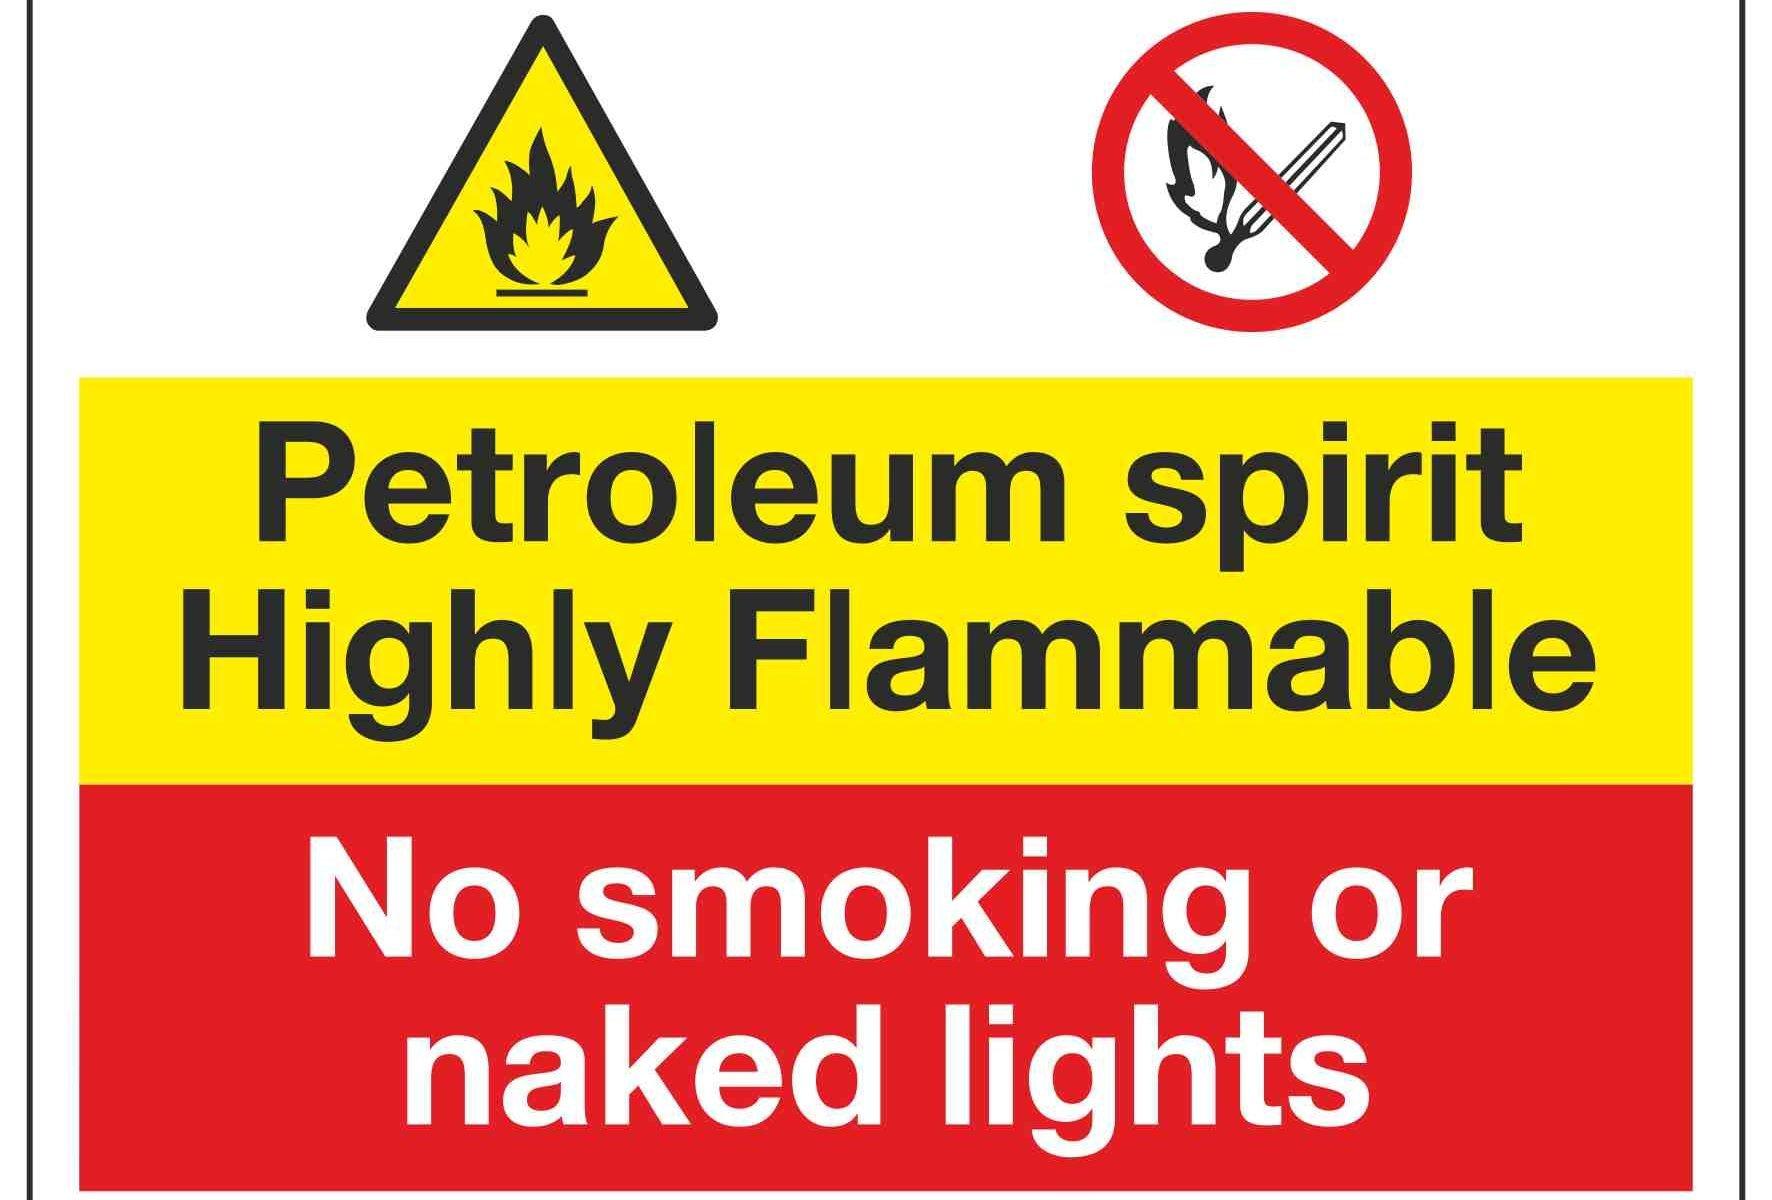 Petroleum spirit Highly Flammable / No smoking or naked lights